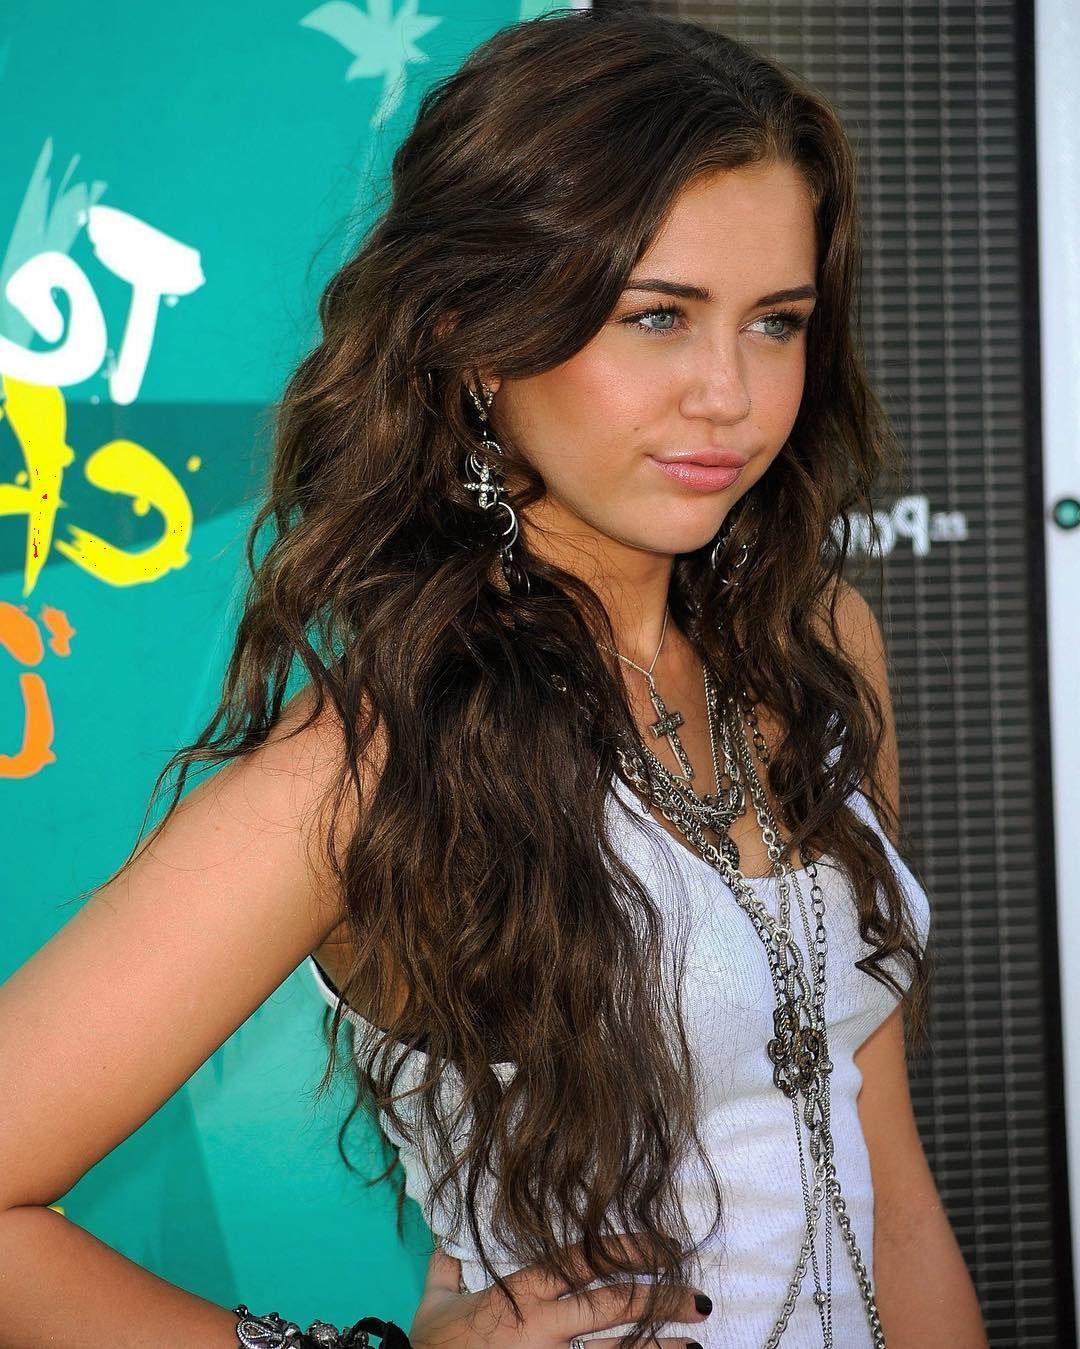 Mileycyrus Last Final Is Tomorow Im Really Nervous Miley Cyrus Brown Hair Miley Cyrus Long Hair Miley Cyrus Hair